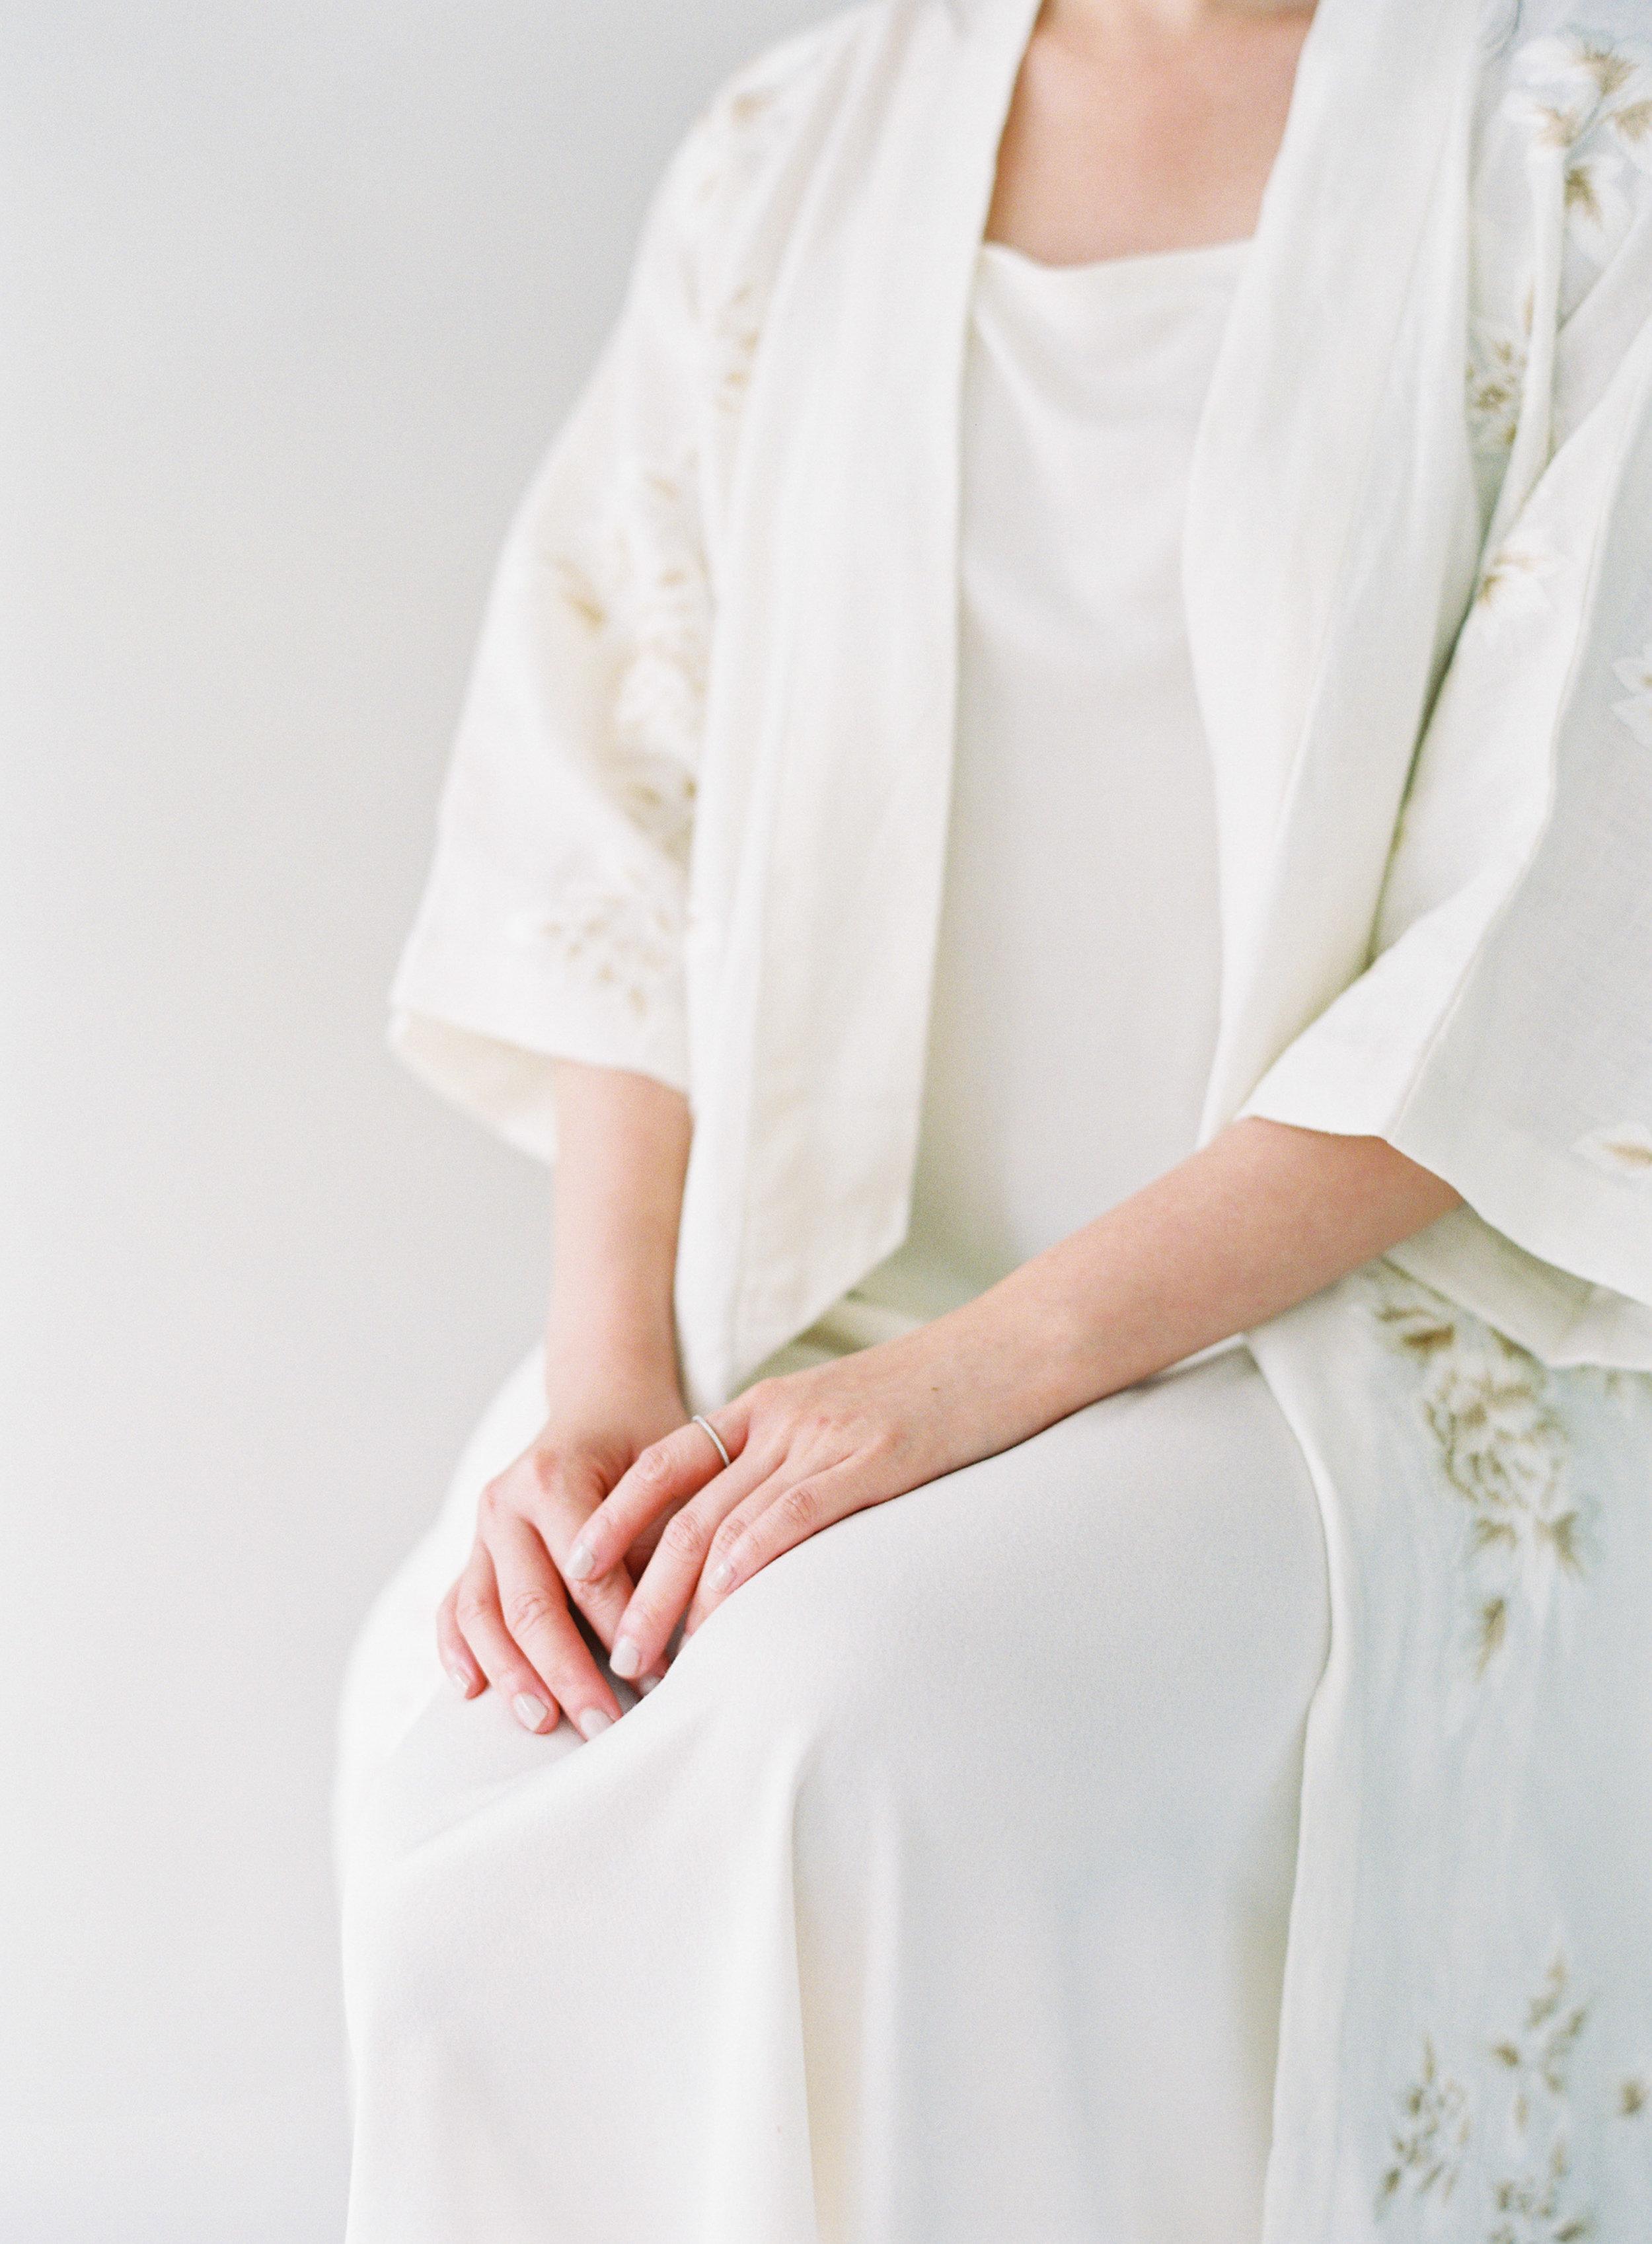 Joyce Li - Designer Portrait SessionTru Lace ArtistryTerrain Styles